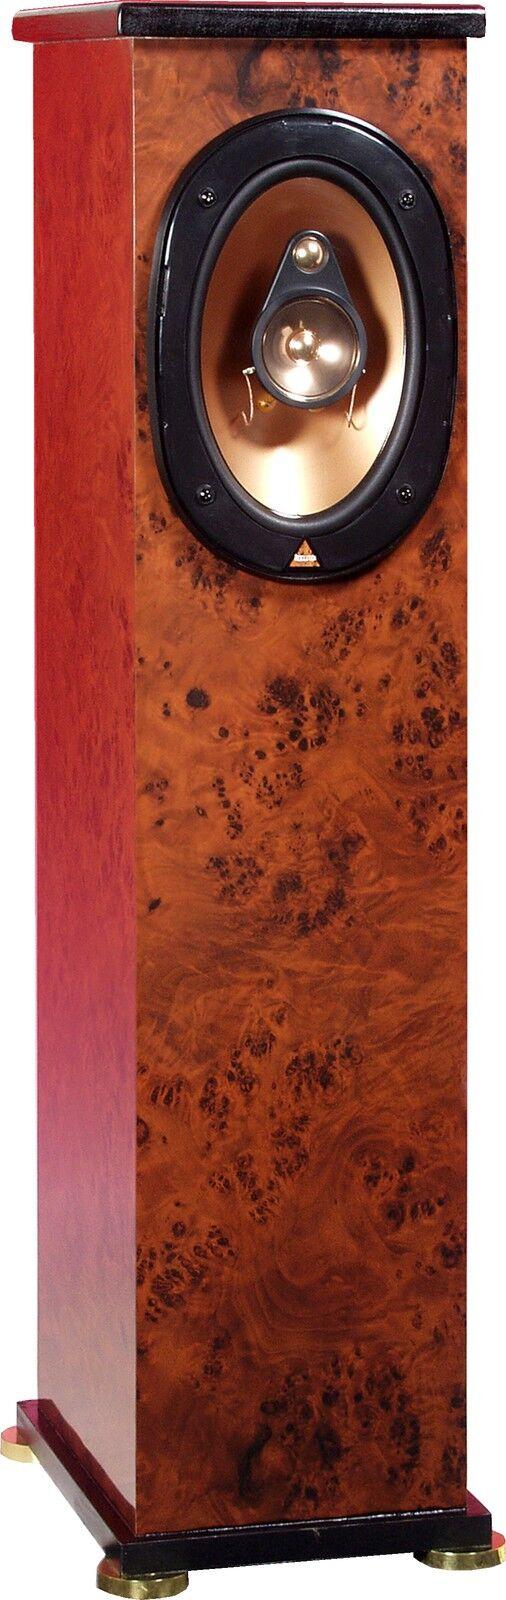 Resolution SUHTL Loudspeakers - Mahogany + Digital Reference Adjustment System